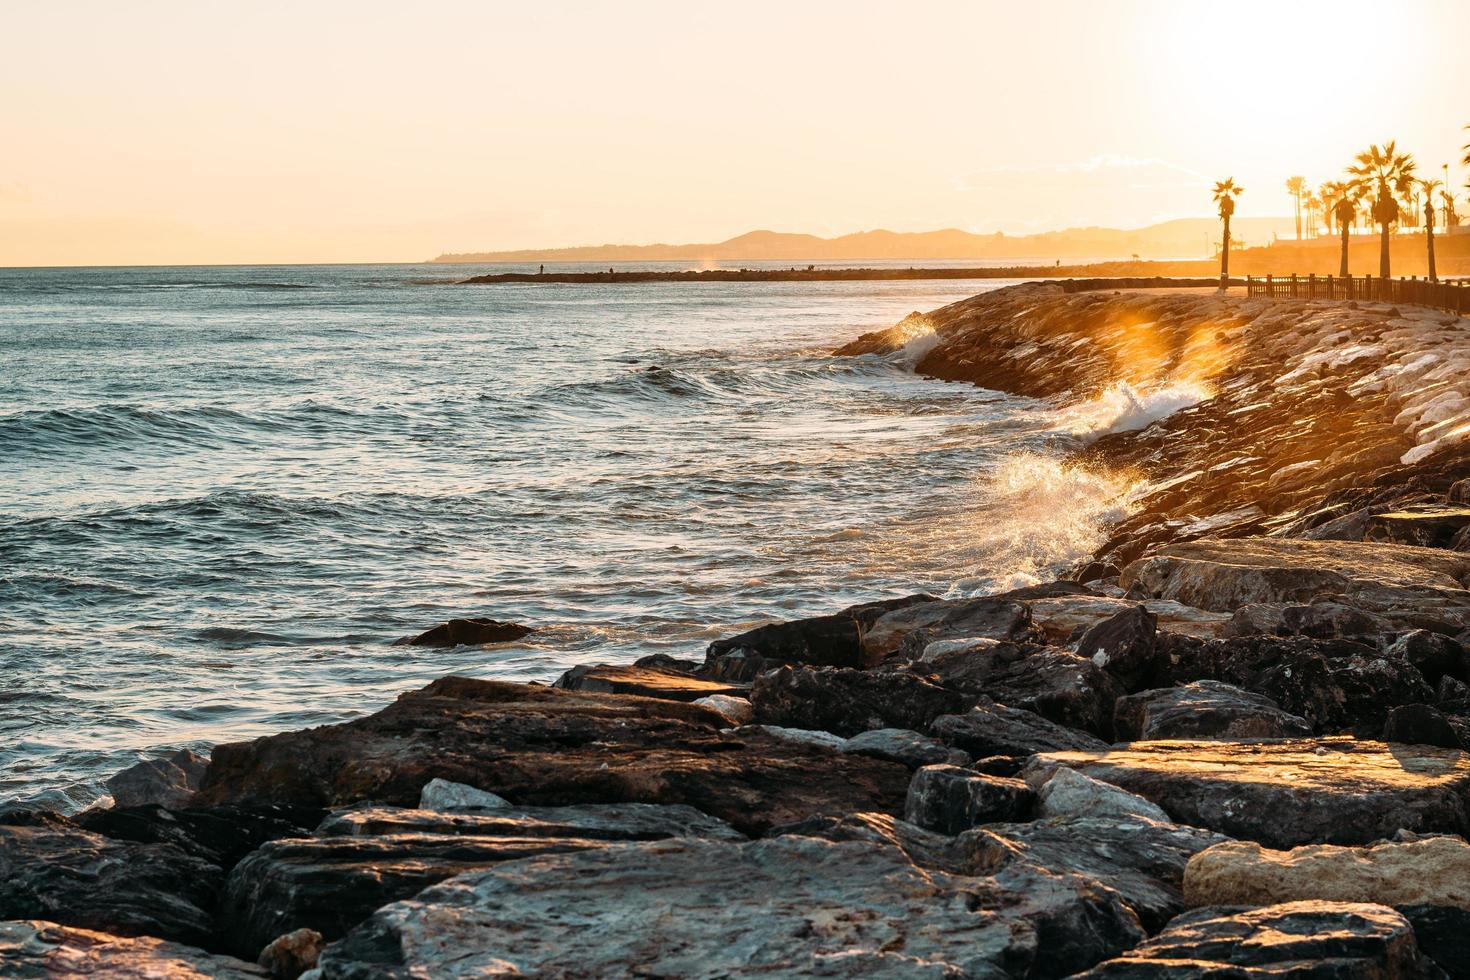 Waves splashing on rocky beach during golden hour photo